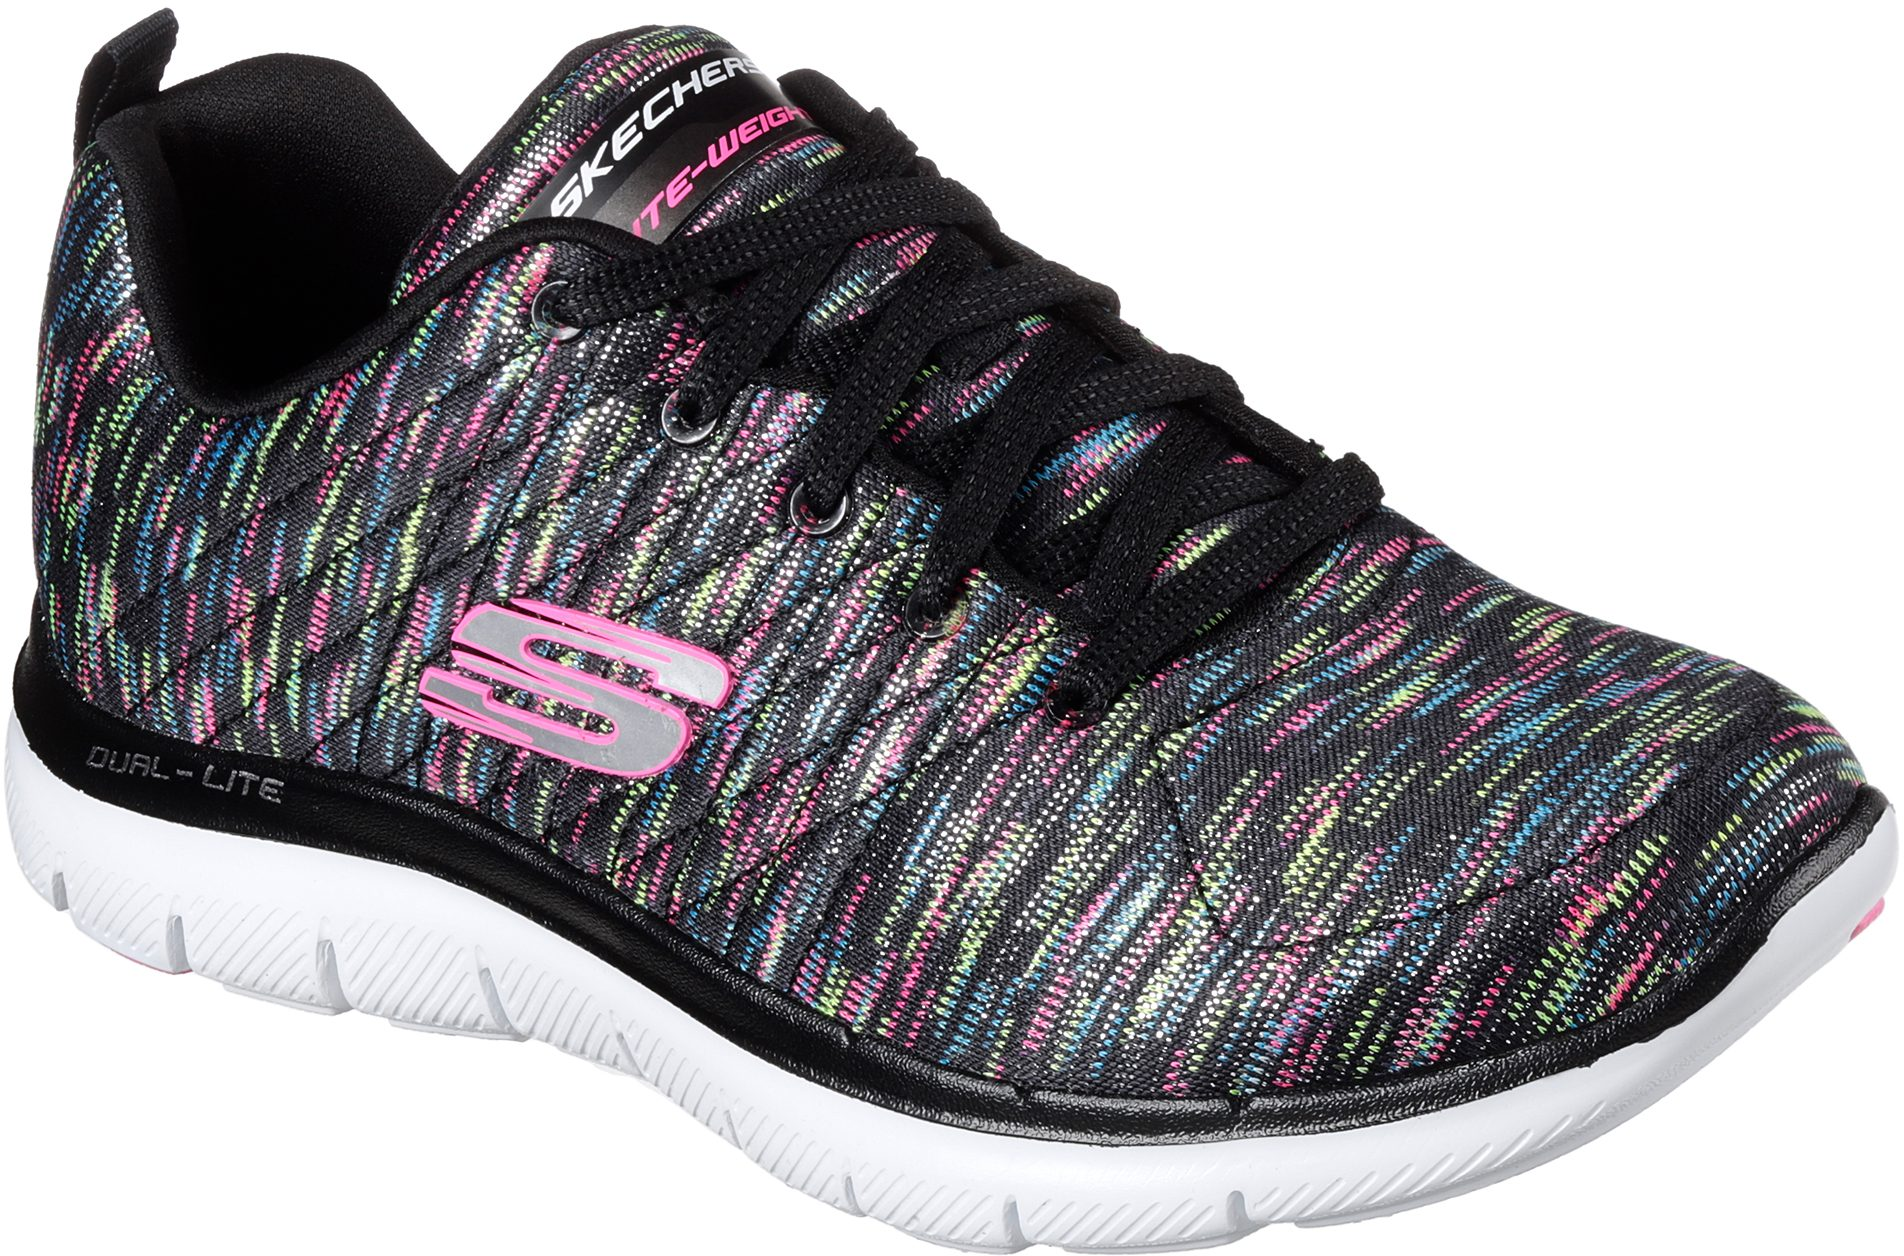 32064ea9c45a Skechers Flex Appeal 2.0 - Reflections Black   Multi 12908 BKMT - Womens  Trainers - Humphries Shoes